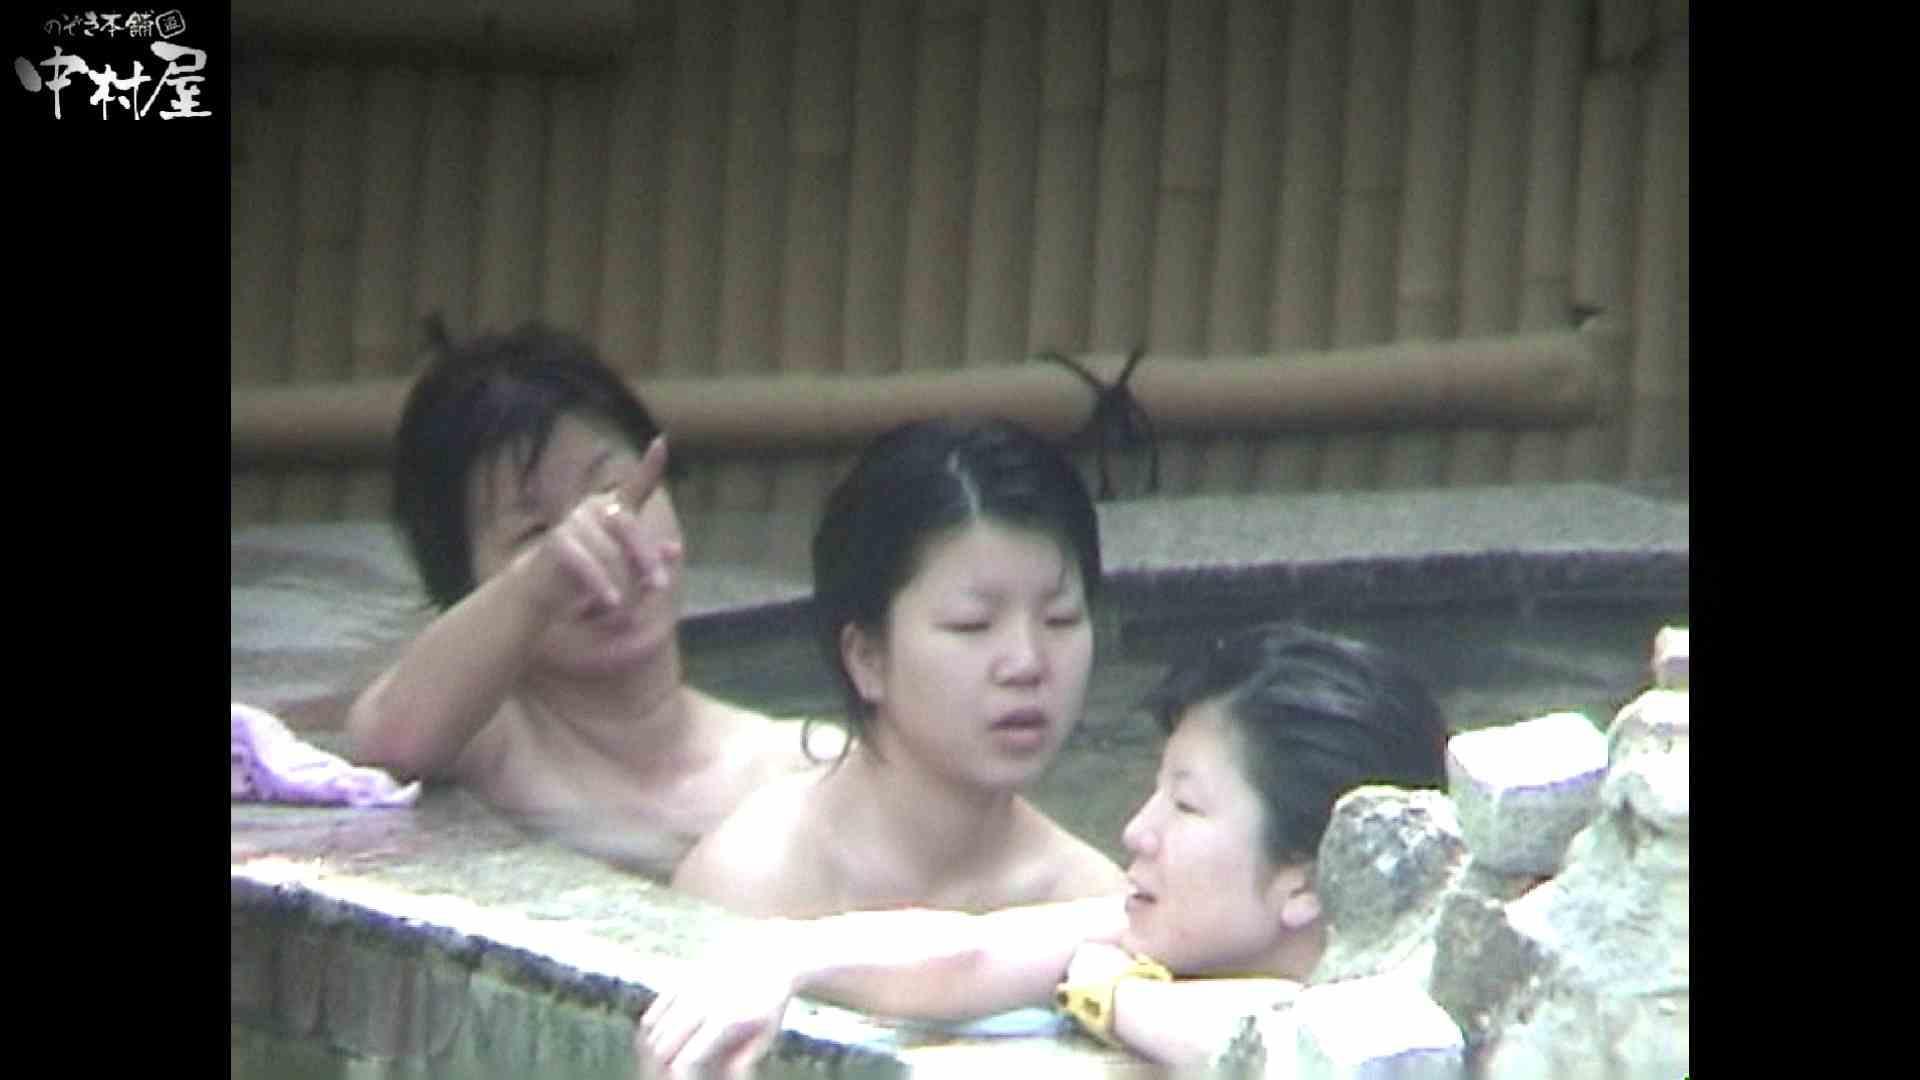 Aquaな露天風呂Vol.936 盗撮映像  110Pix 62